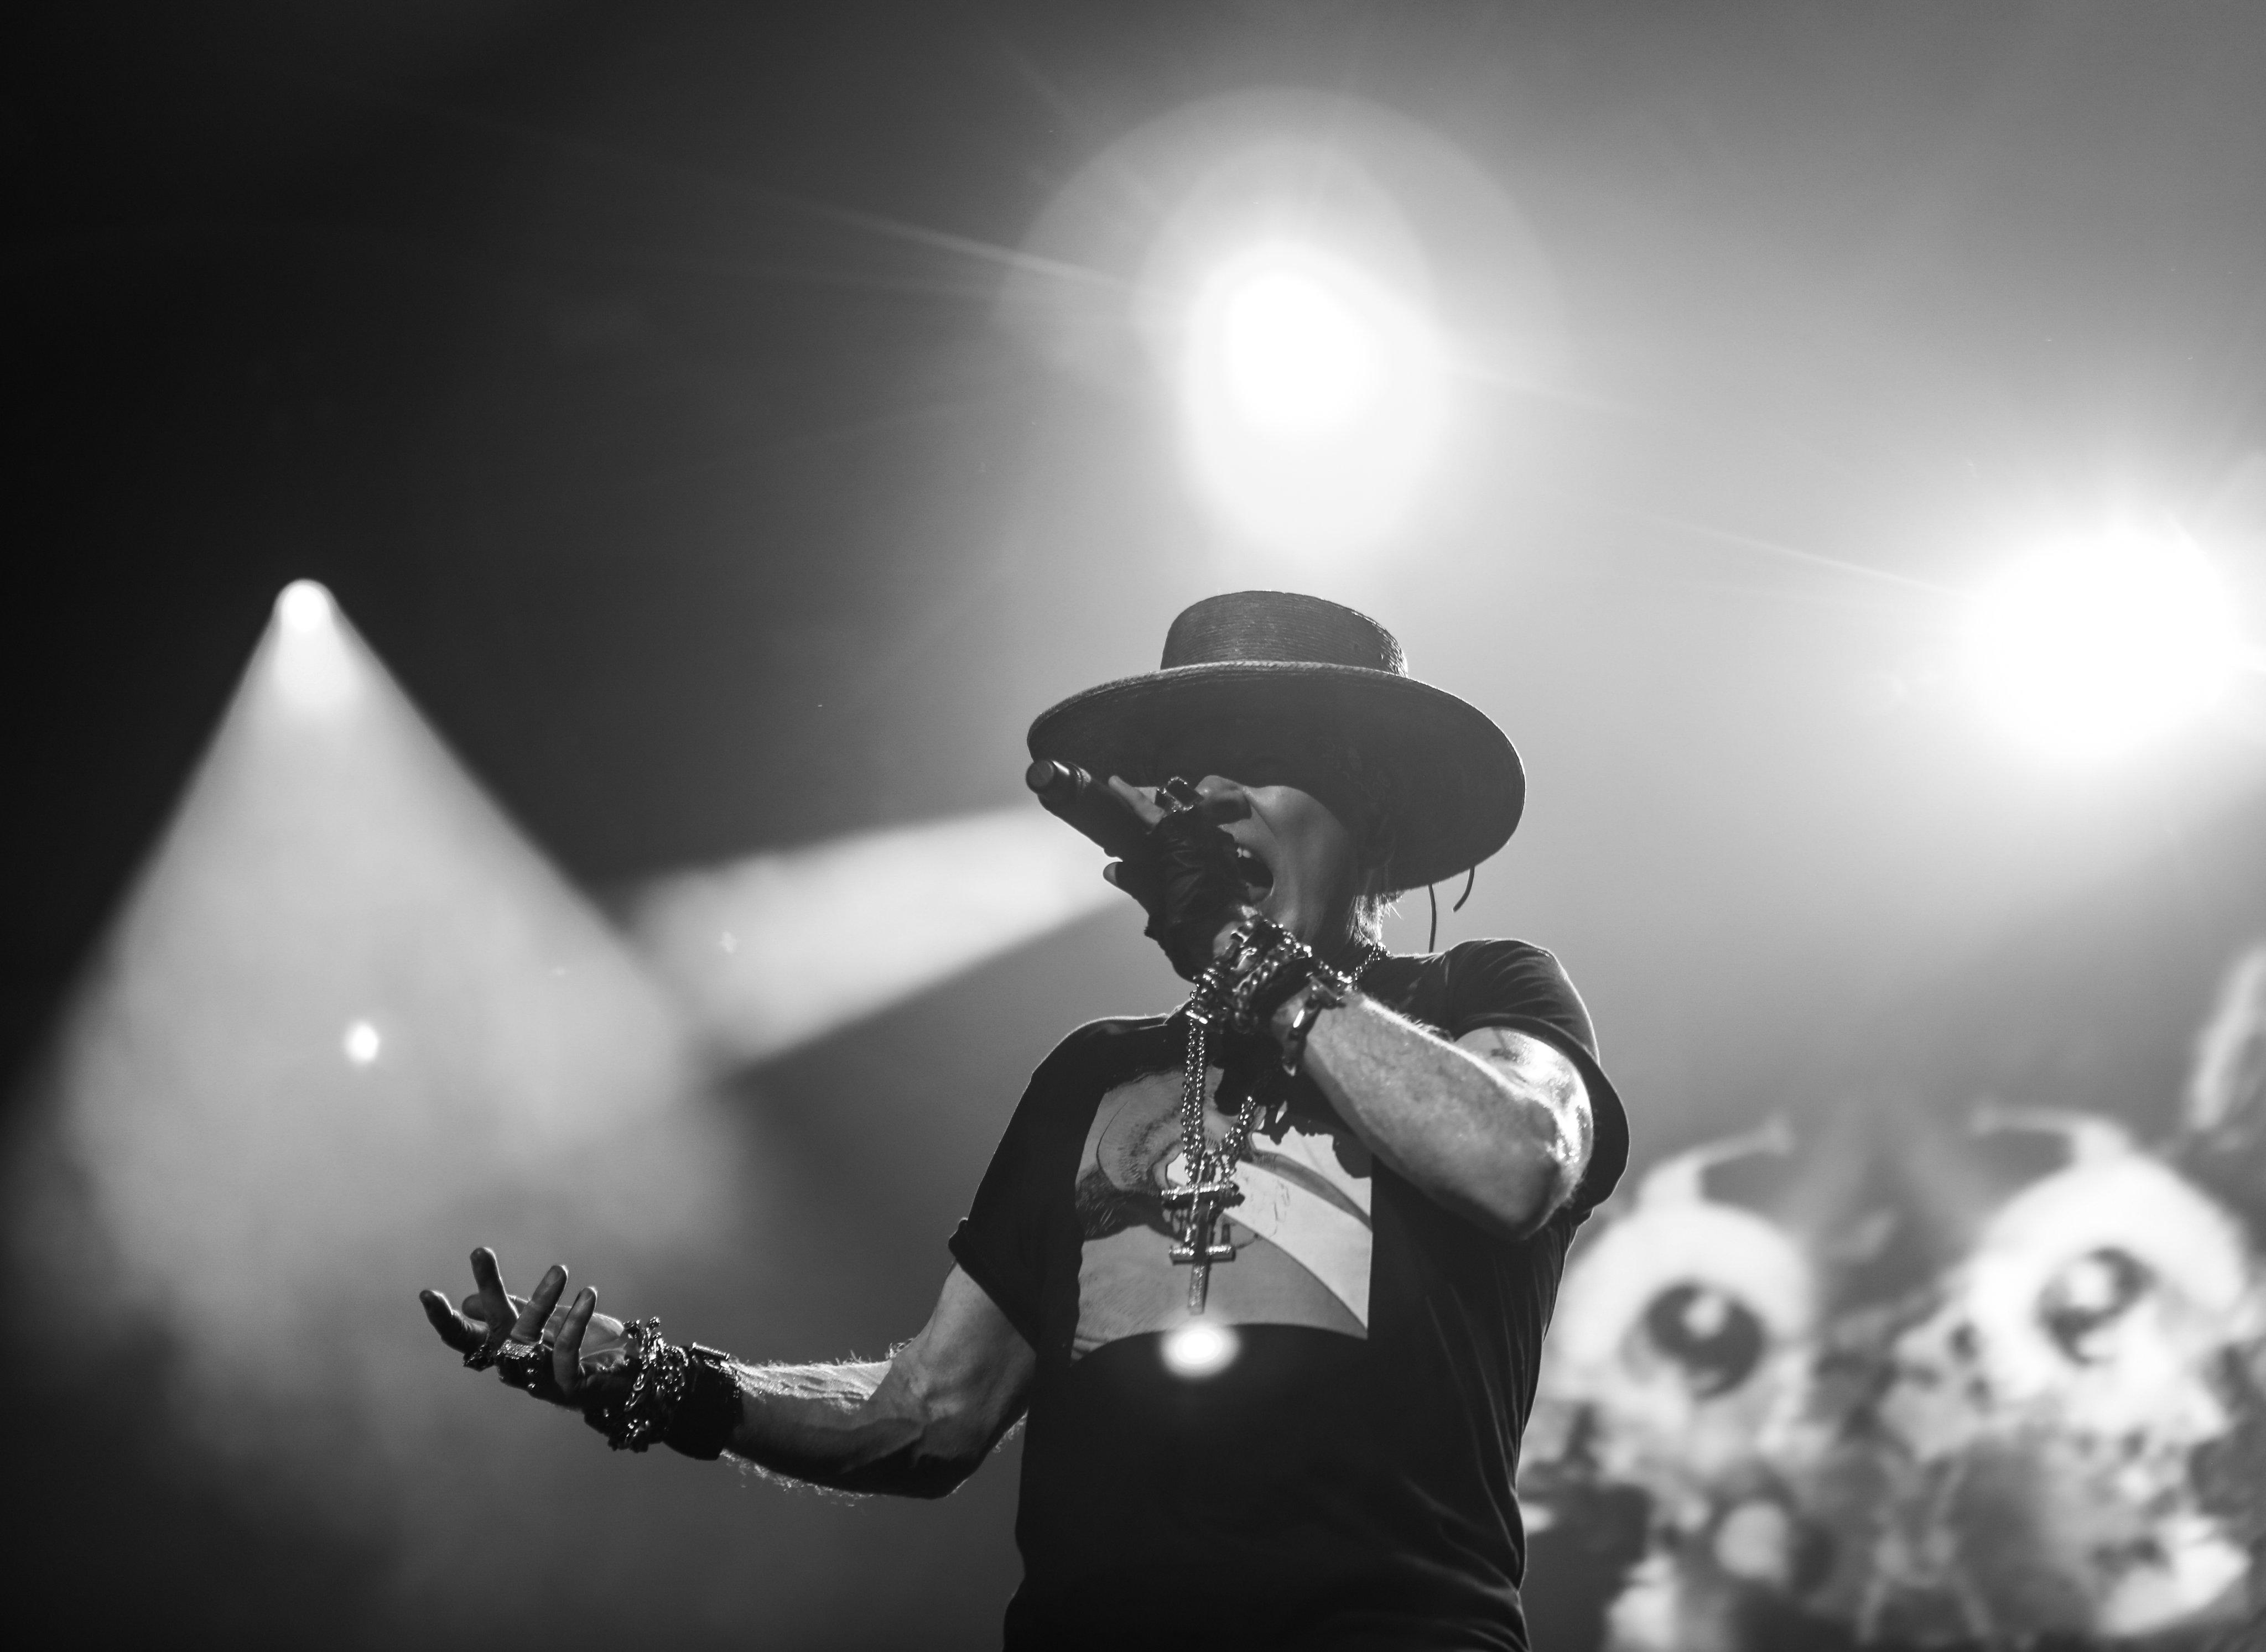 2021.09.11 - Hard Rock Live at Etess Arena, Atlantic City, NJ, USA E_r45o11